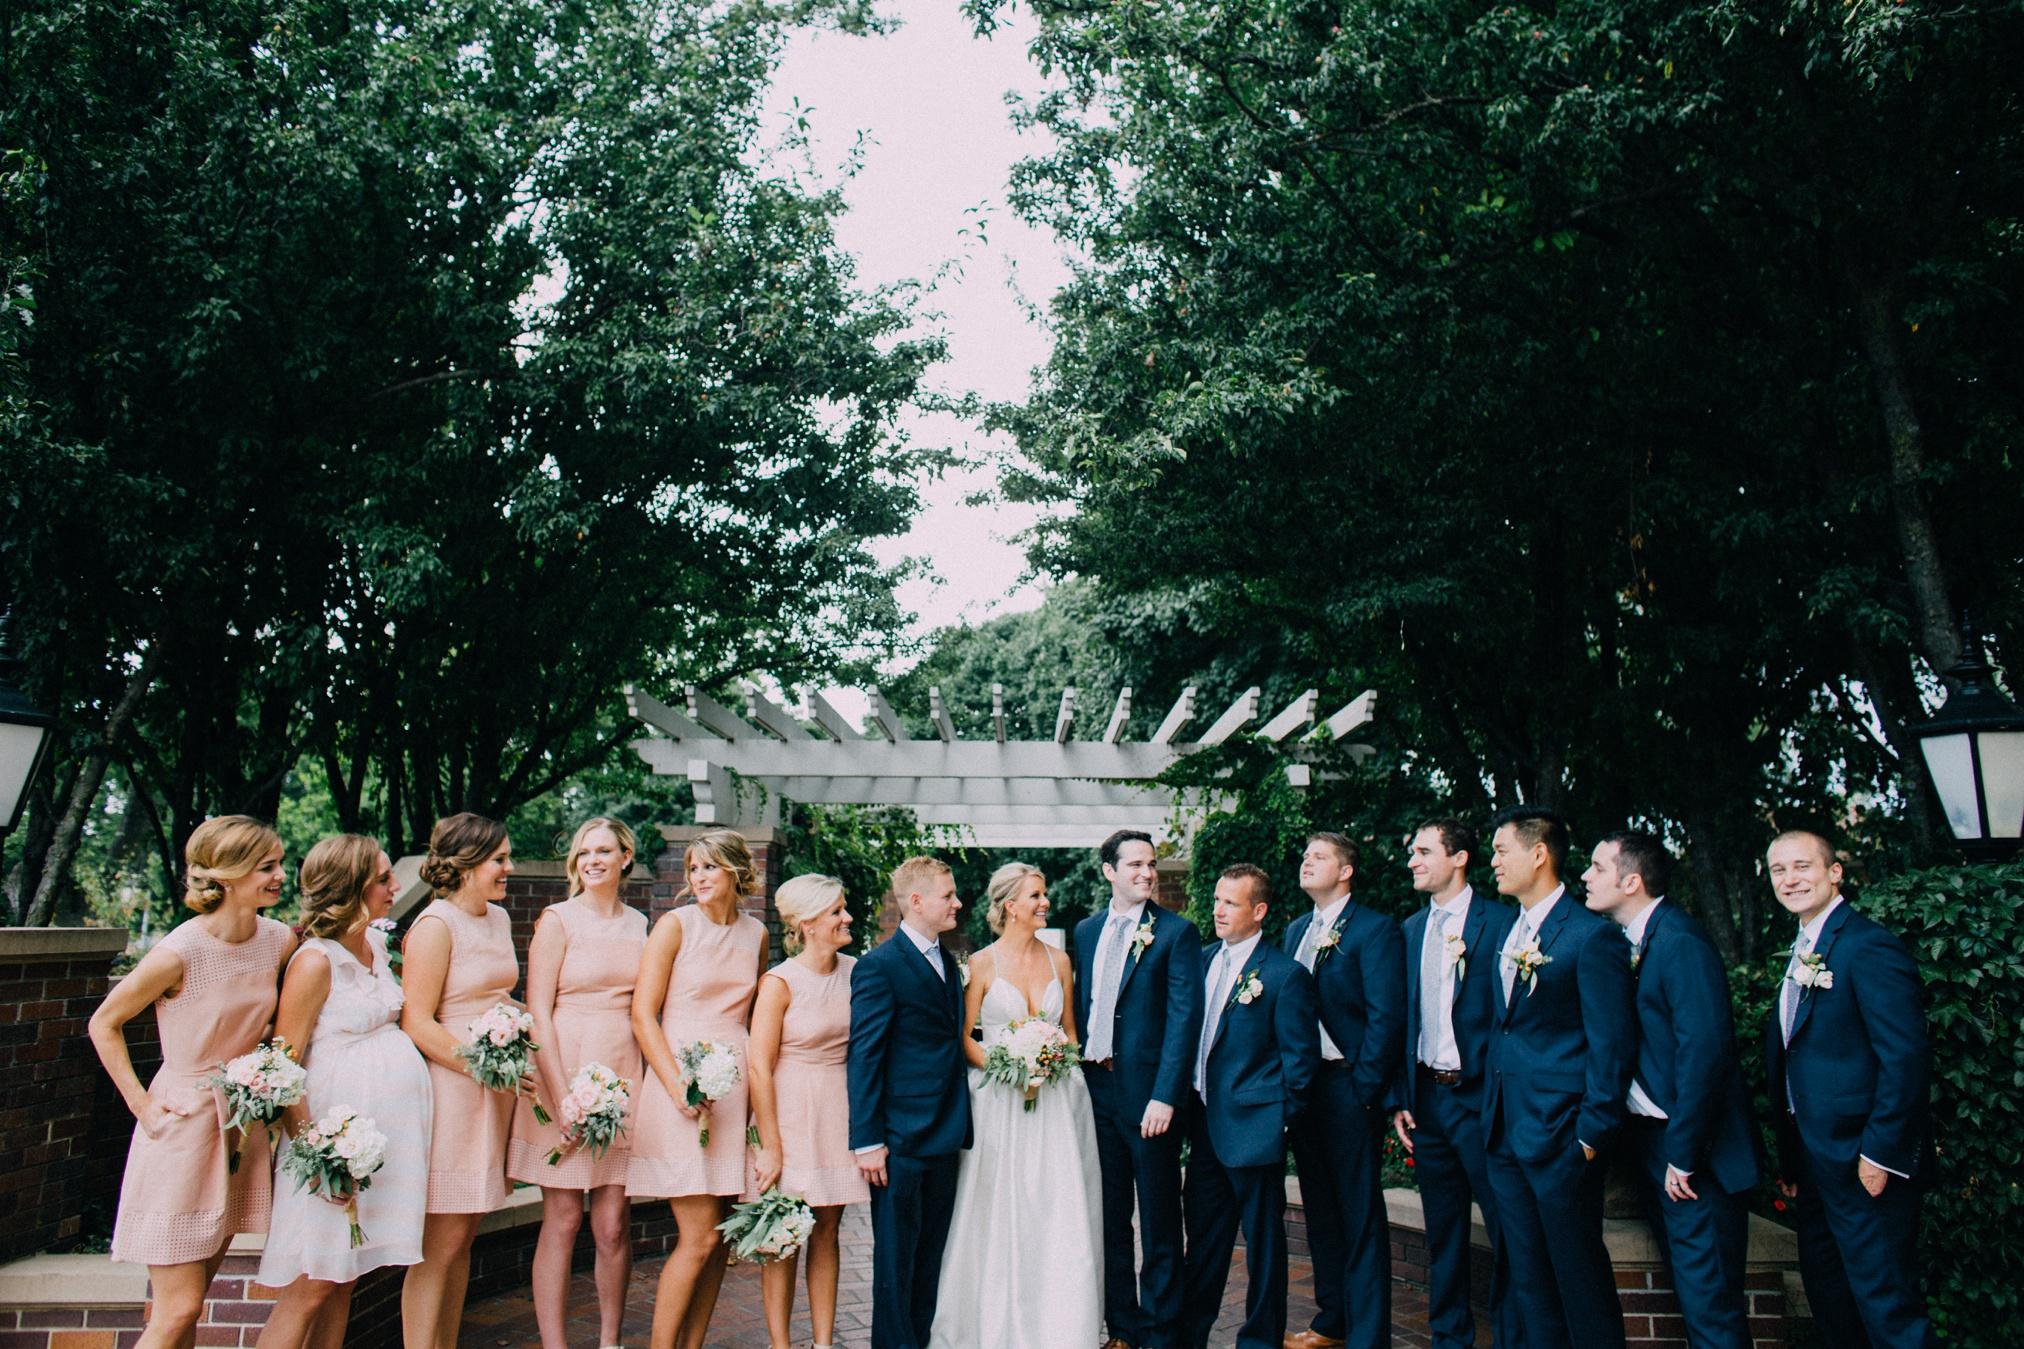 brenna+michael_wedding-500.jpg